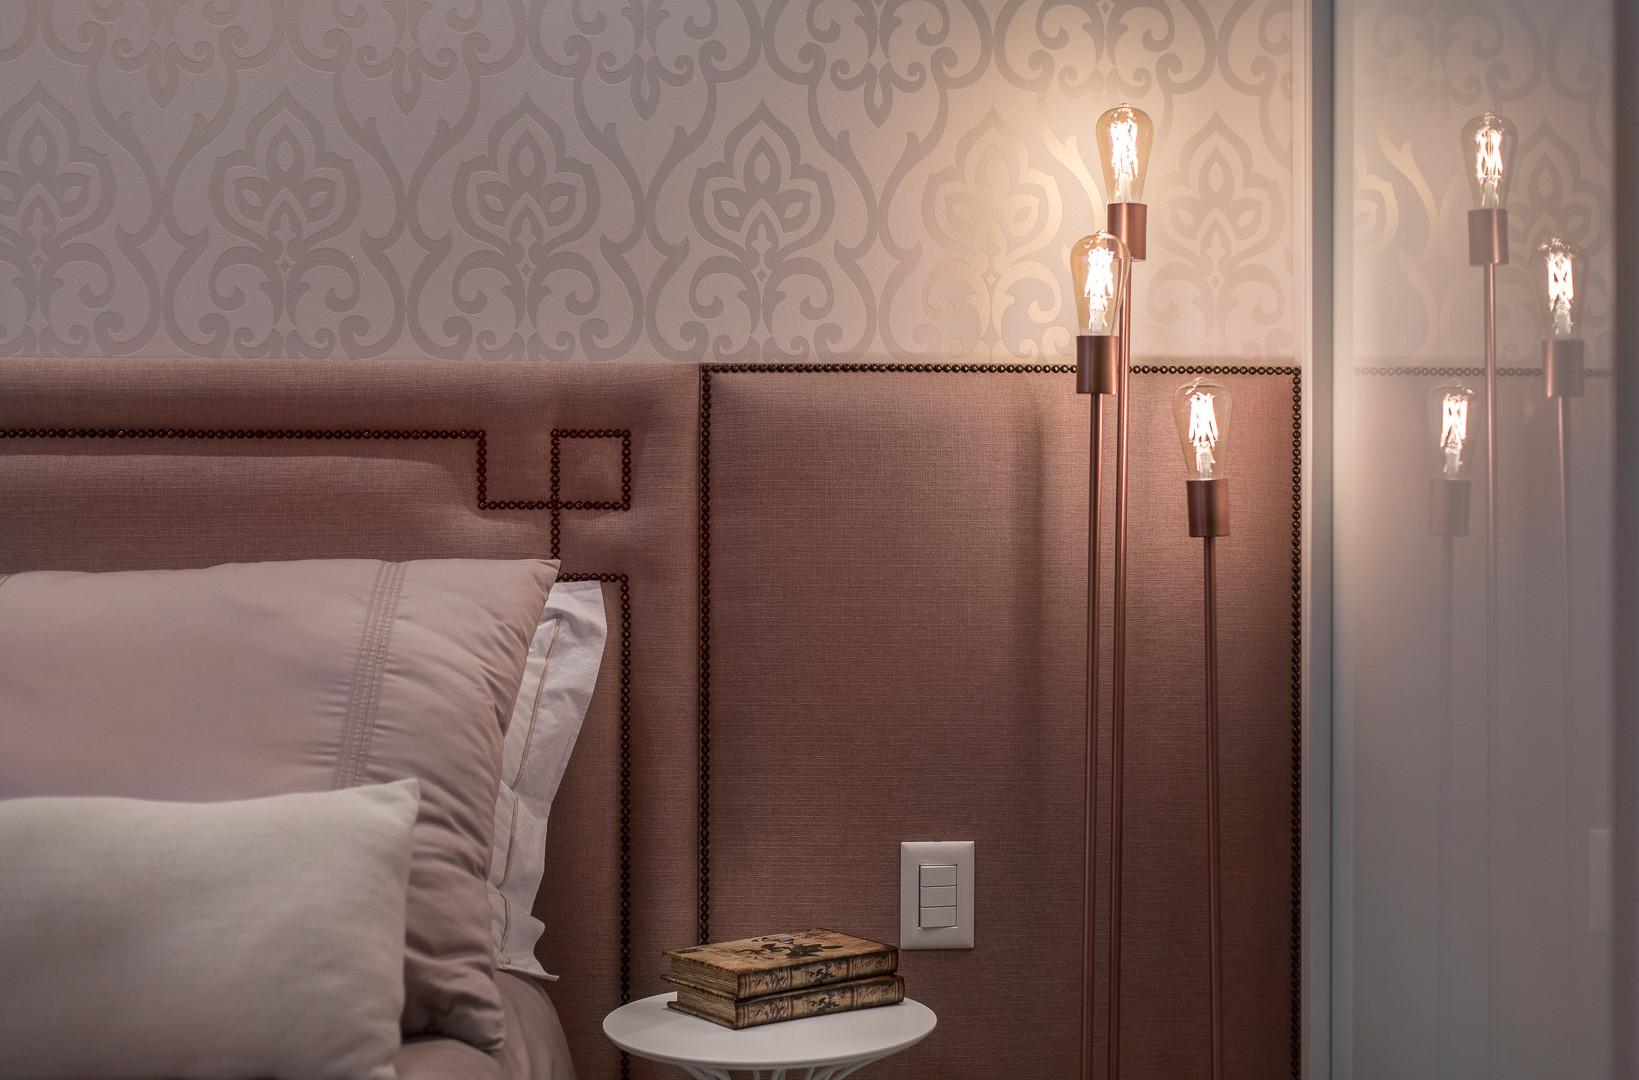 baturite-lounge-house-suite-1-detalhe-1.jpg